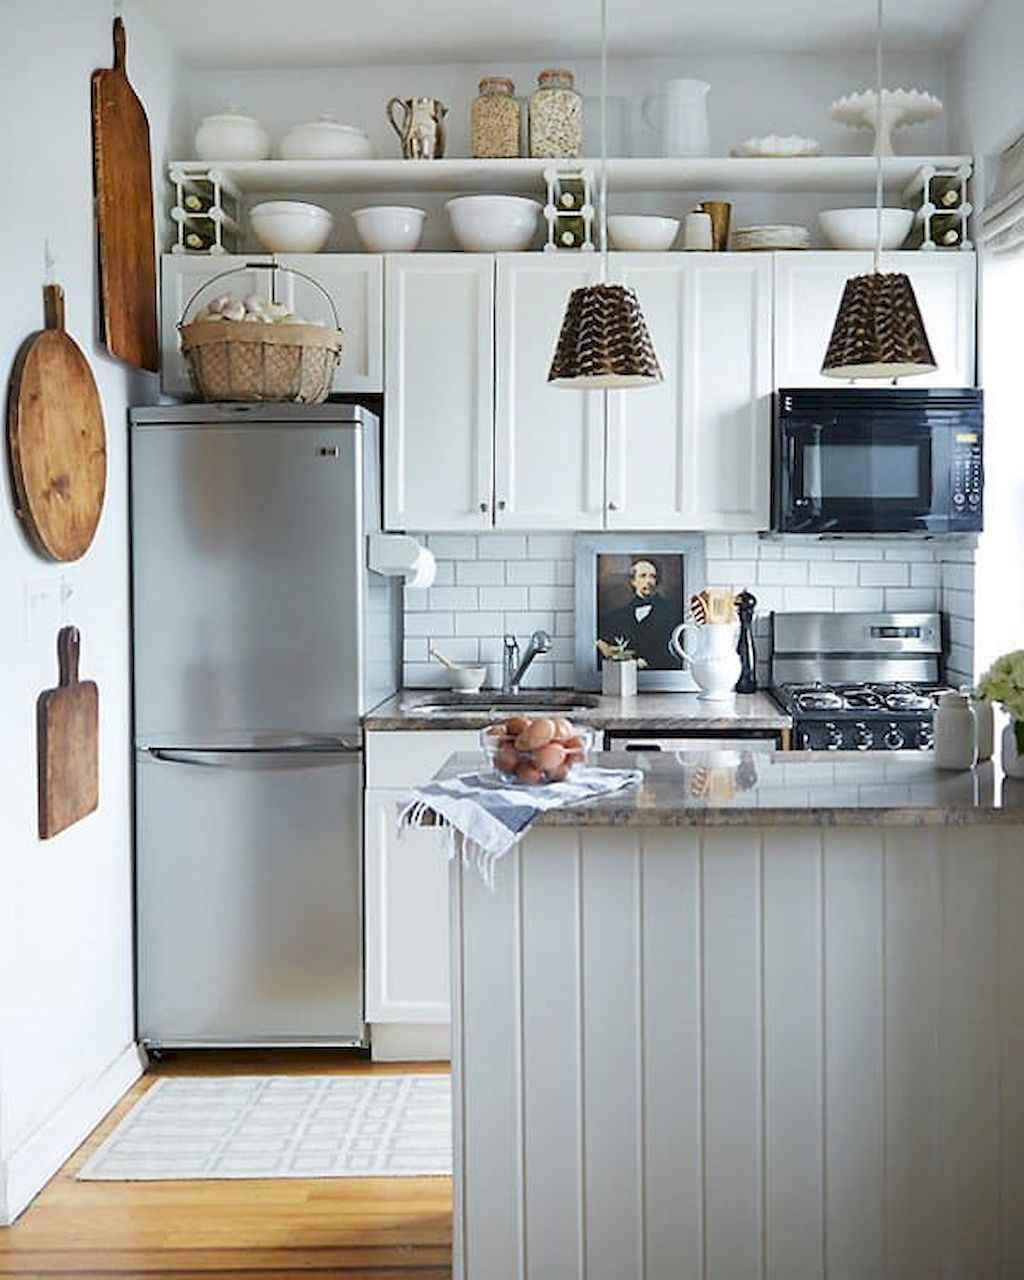 50 Amazing Small Apartment Kitchen Decor Ideas 7